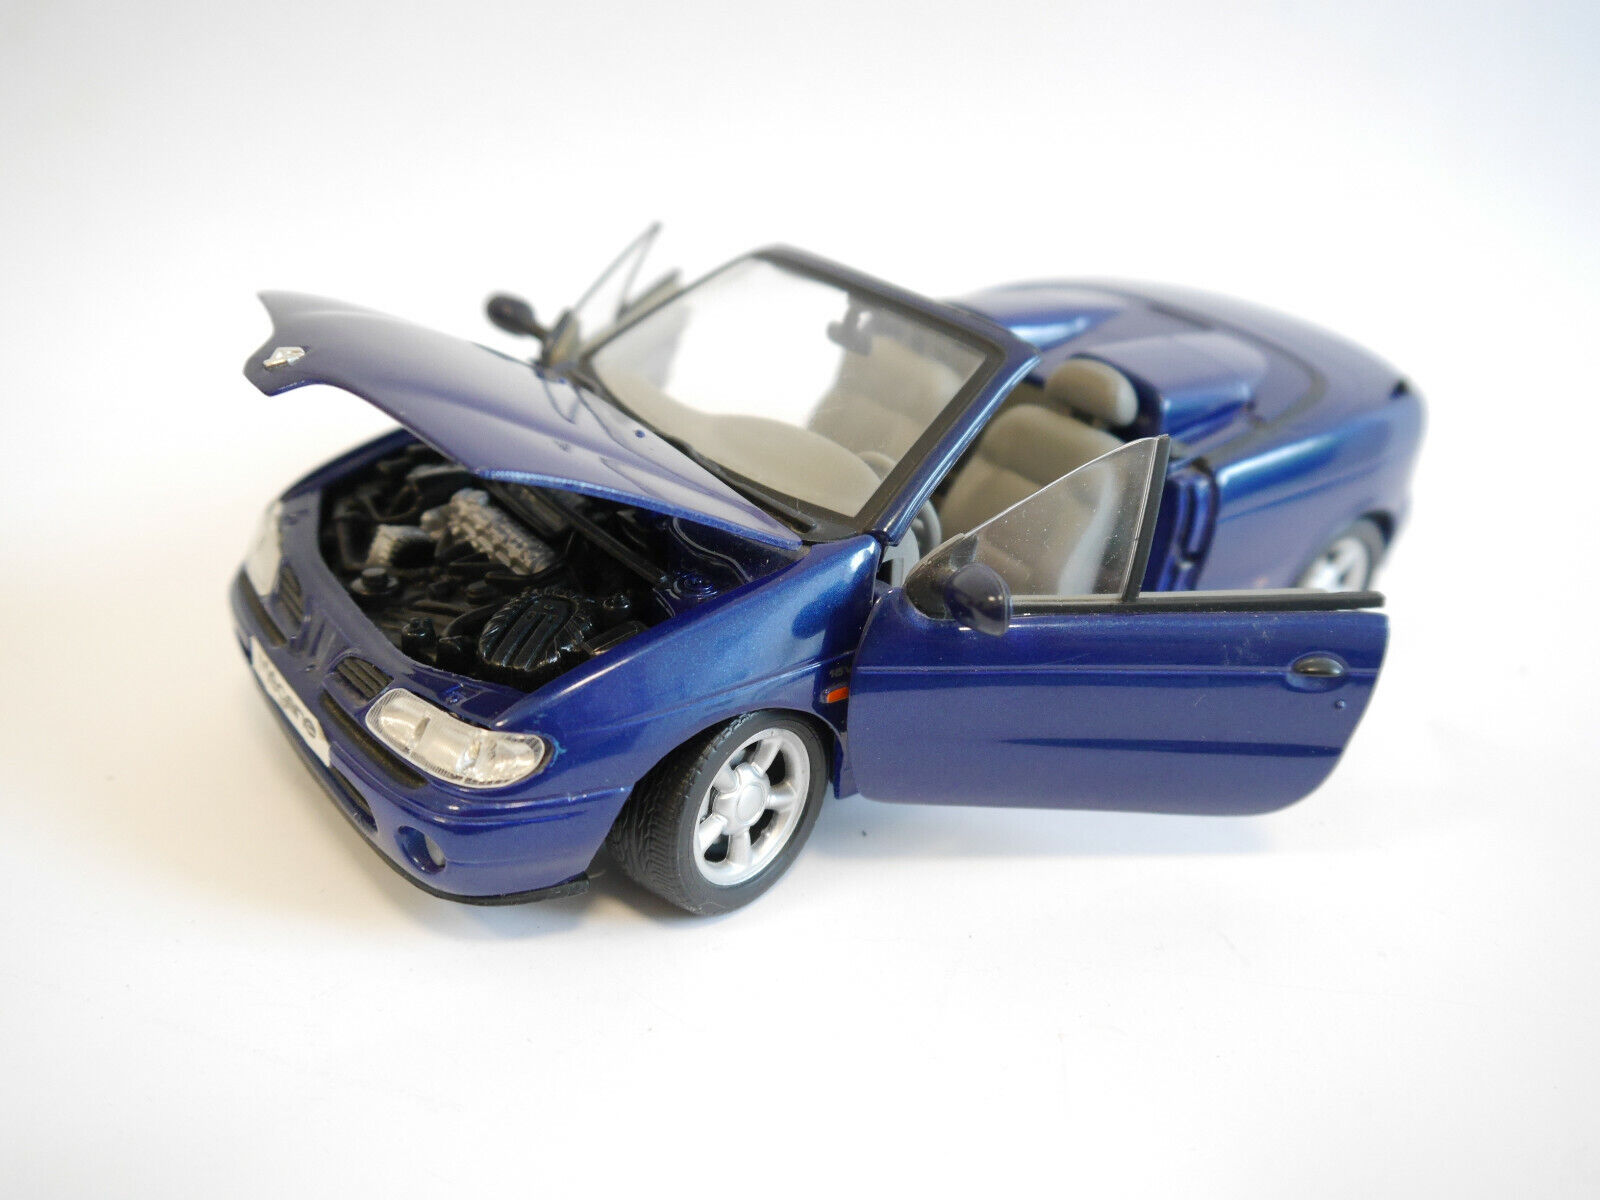 RENAULT Megane Cabriolet Cabrio Converdeible BLU blu blu METALLIZZATO, Anson 1 18